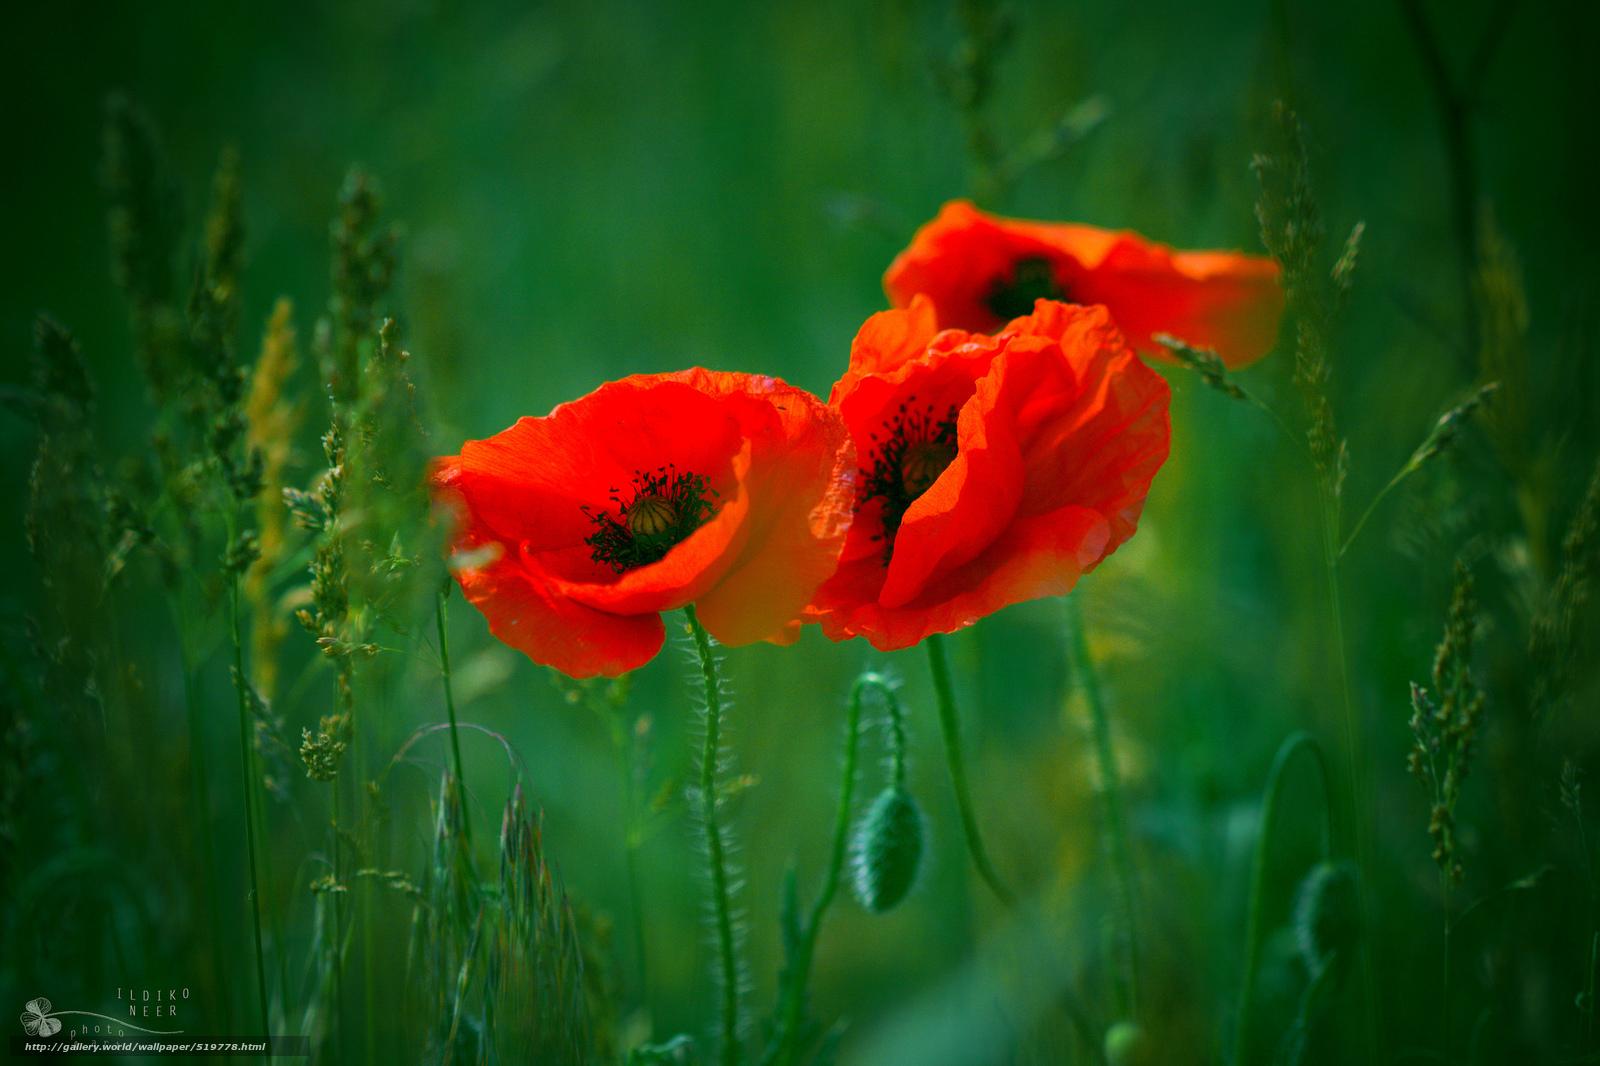 Greens poppies gras rot drei ildiko neer